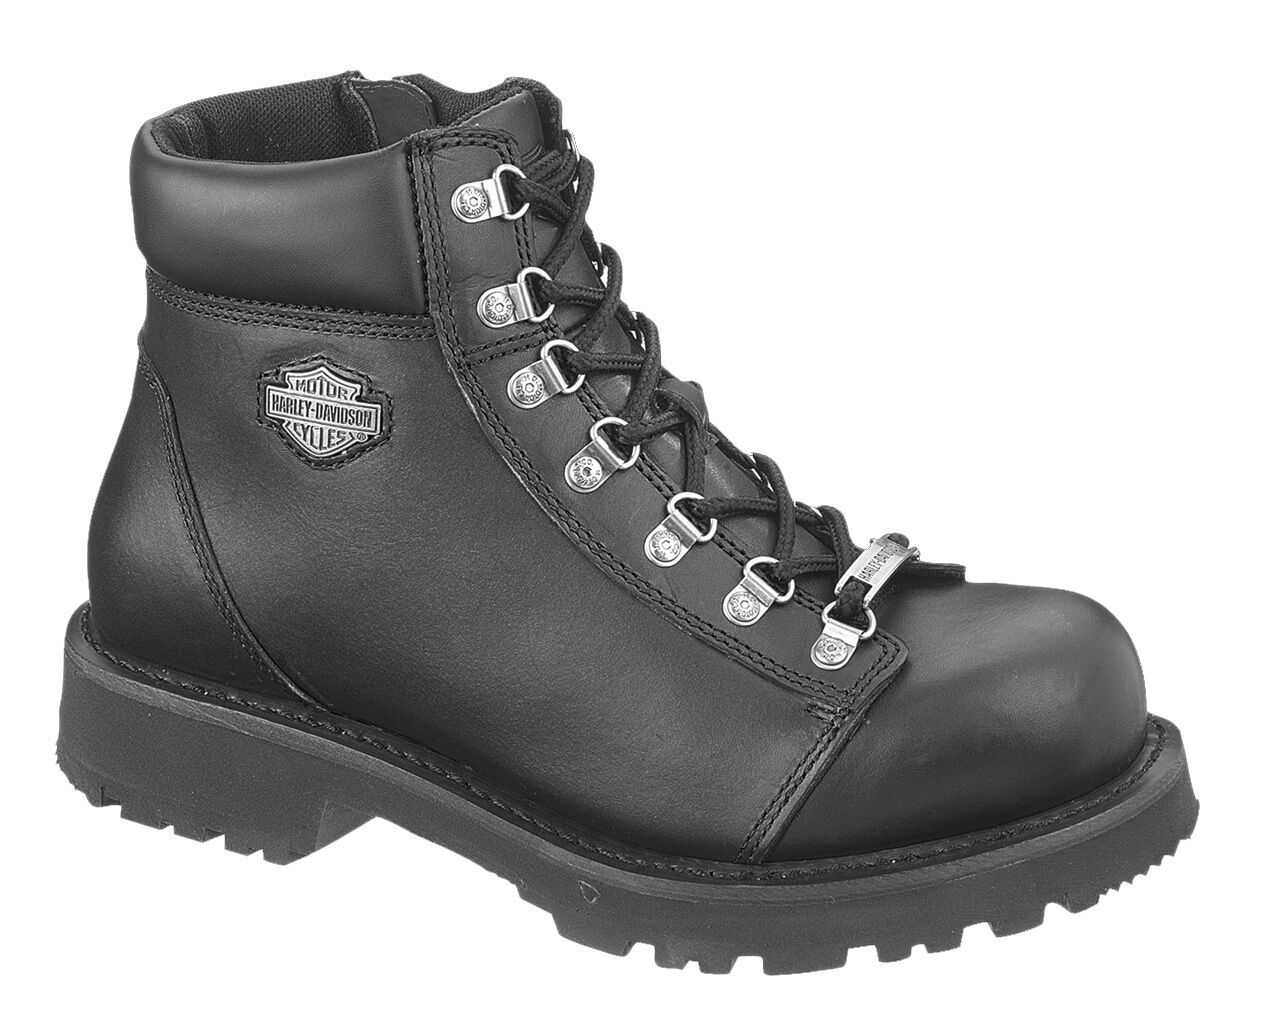 nouveau Pour des hommes HARLEY DAVIDSON WYOMING noir bottes  98019 Taille 13US  OUT OF STOCK